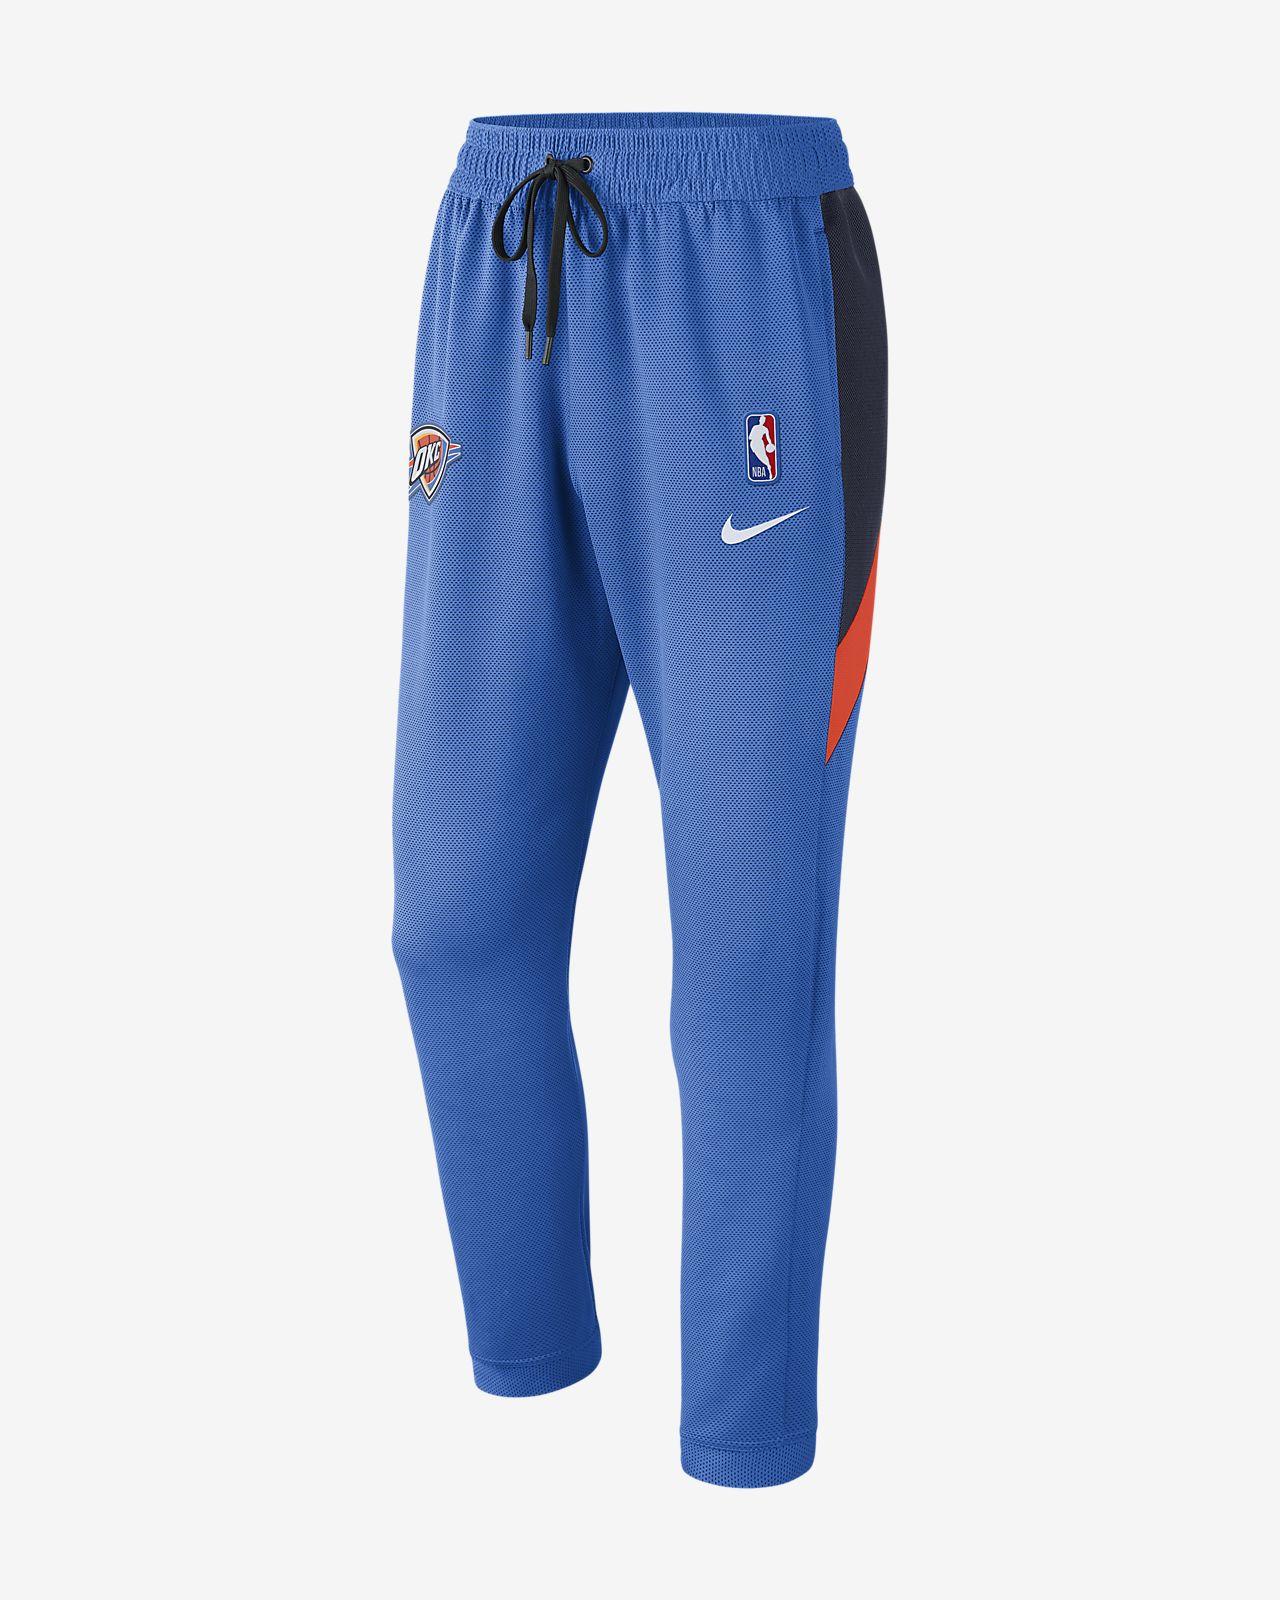 Oklahoma City Thunder Nike Therma Flex Showtime NBA-Hose für Herren